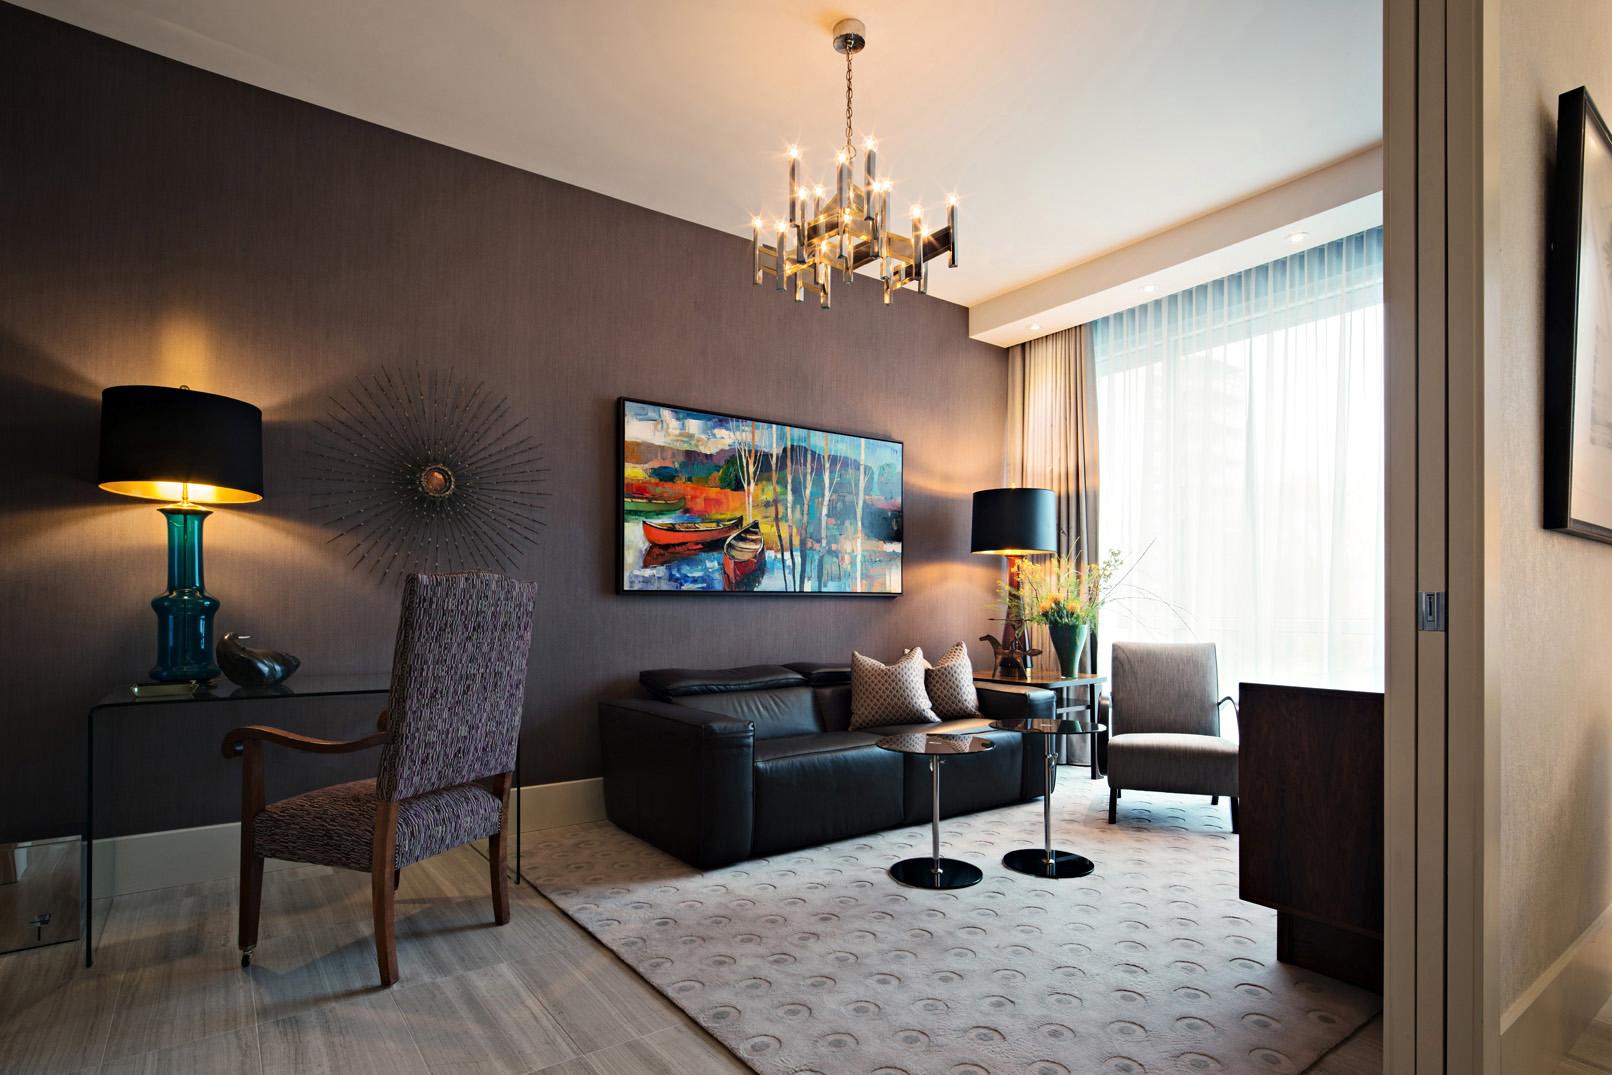 interiors-photography-westmount-condo-Jeffrey-Lamb-003